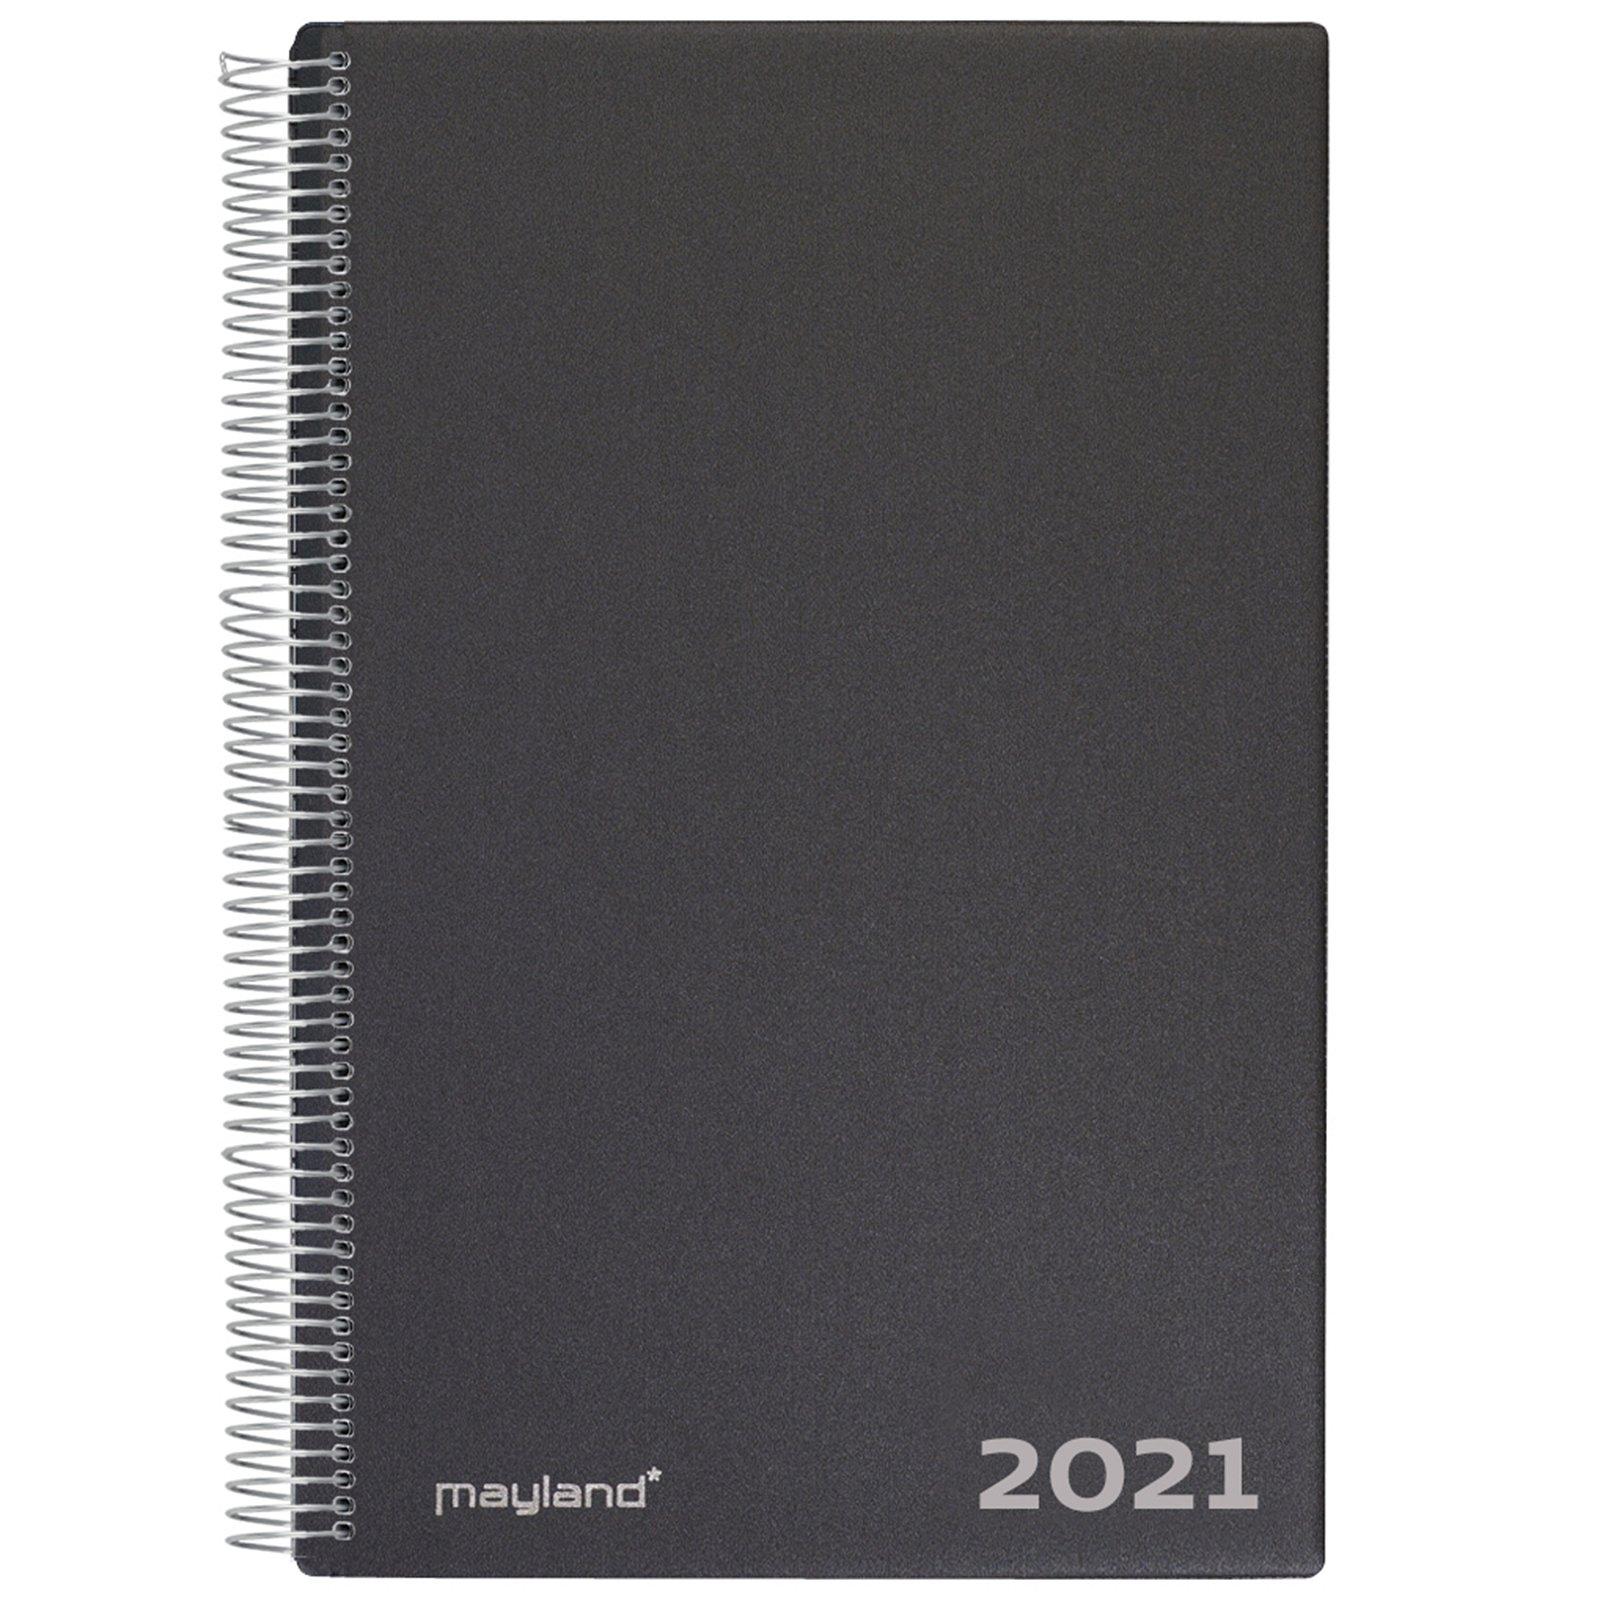 Mayland Aftalekalender, 1-dag,  2022